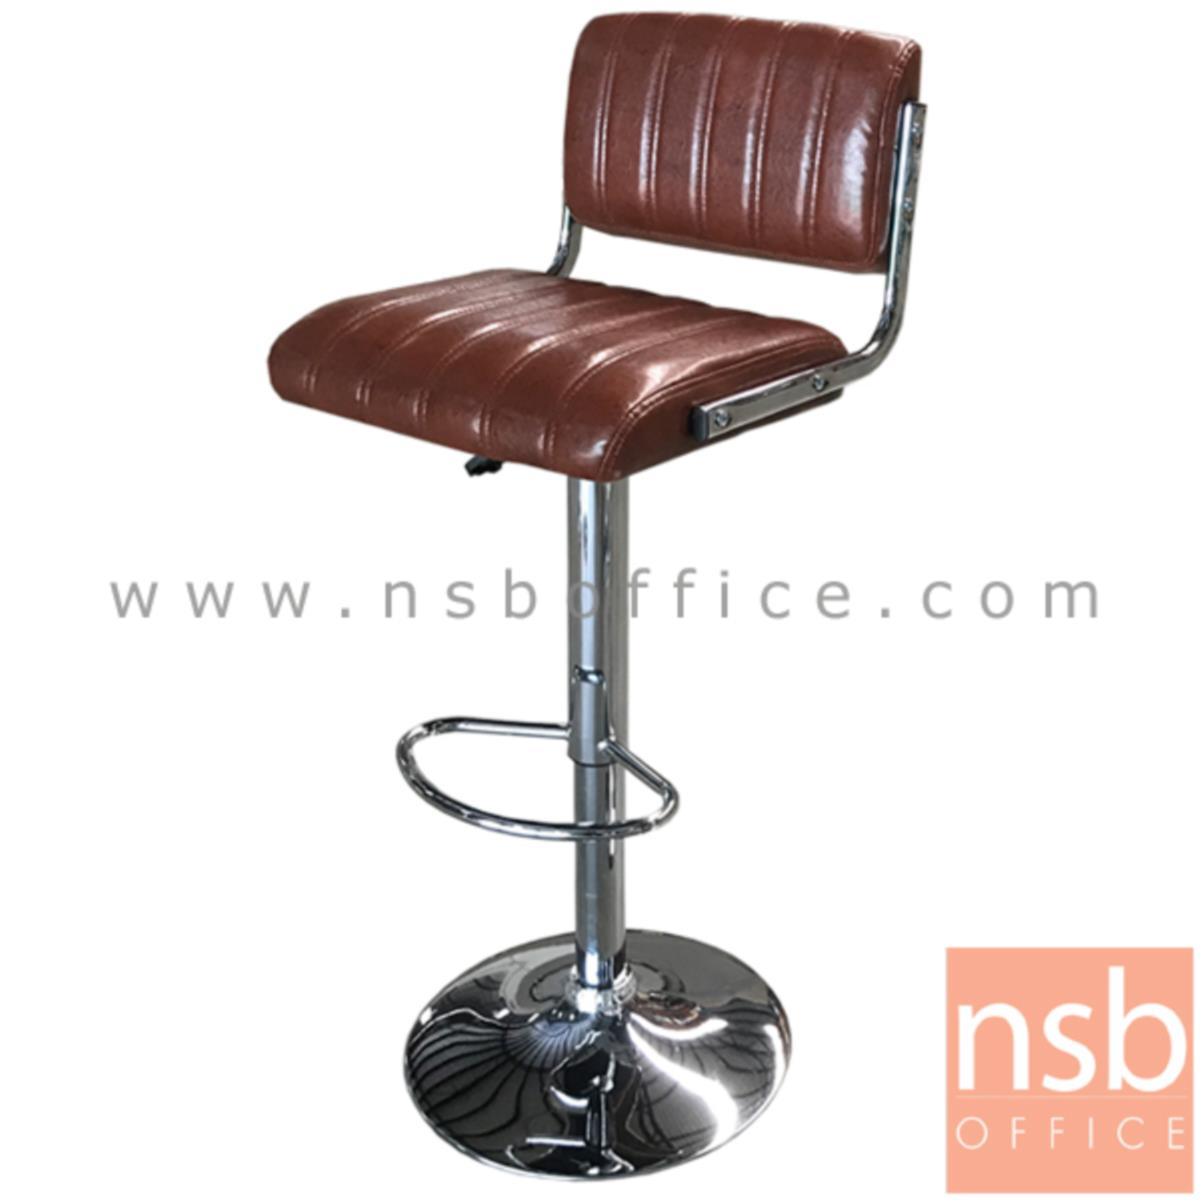 B18A034:เก้าอี้บาร์สูงหนัง PU BY-CAST   รุ่น Motley (มอตลีย์) ขนาด 43W cm. โช๊คแก๊ส ขาโครเมี่ยมฐานจานกลม